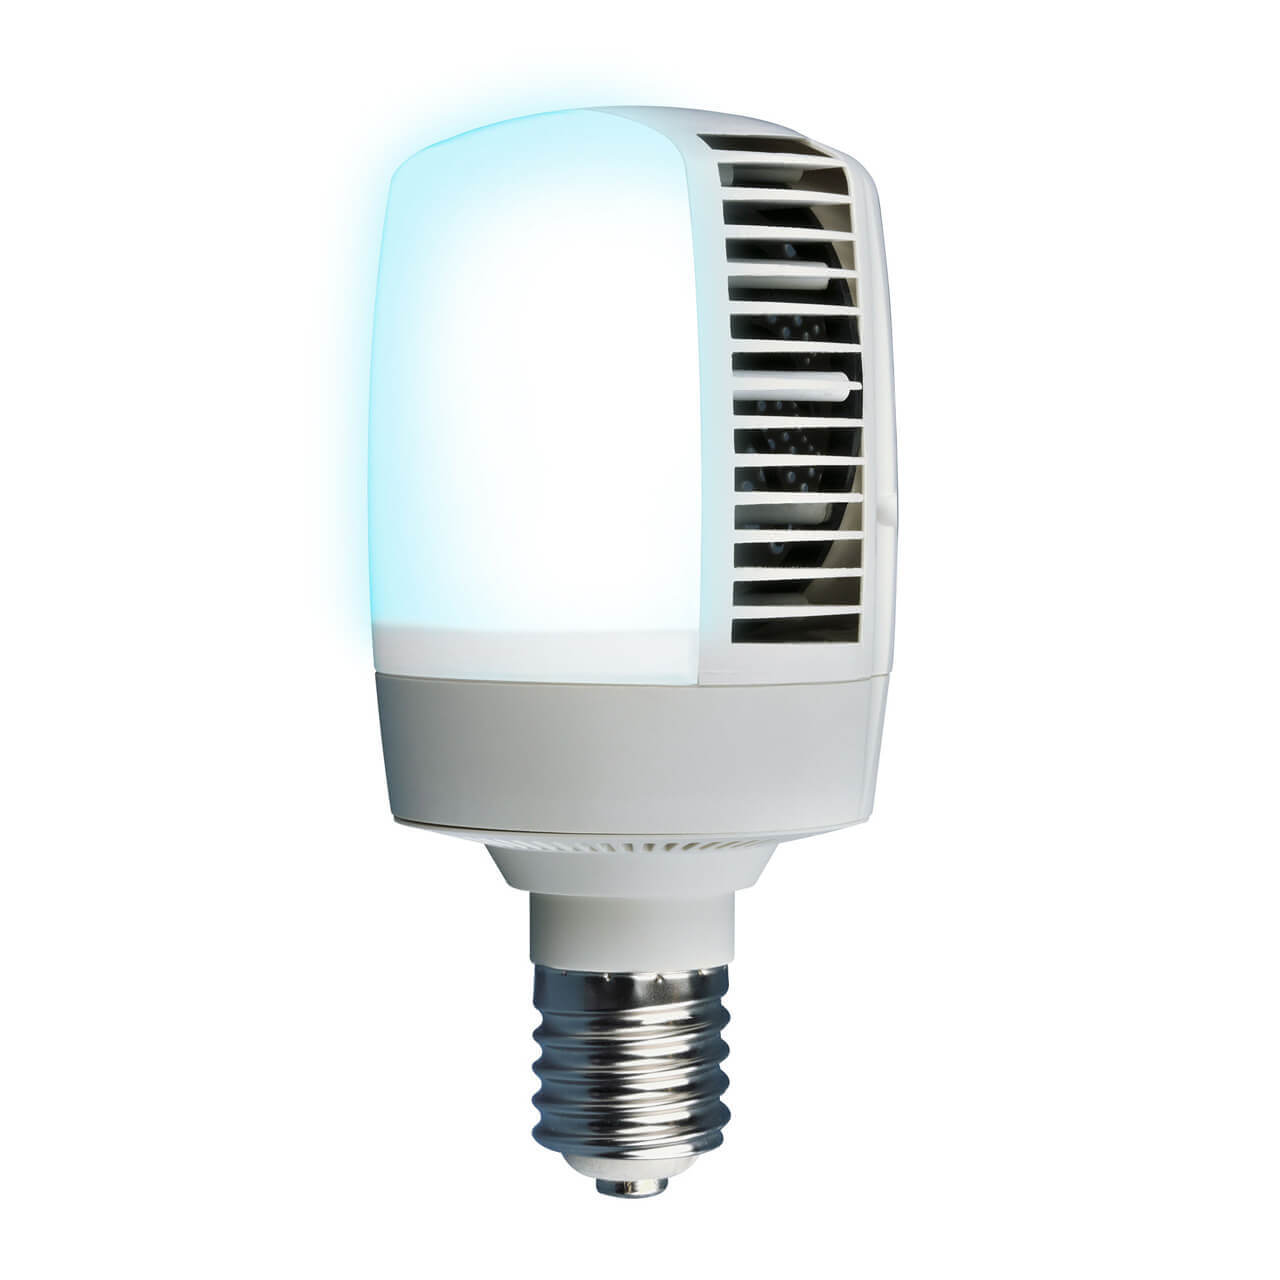 Лампочка Uniel LED-M105-70W/NW/E40/FR ALV02WH Venturo M105